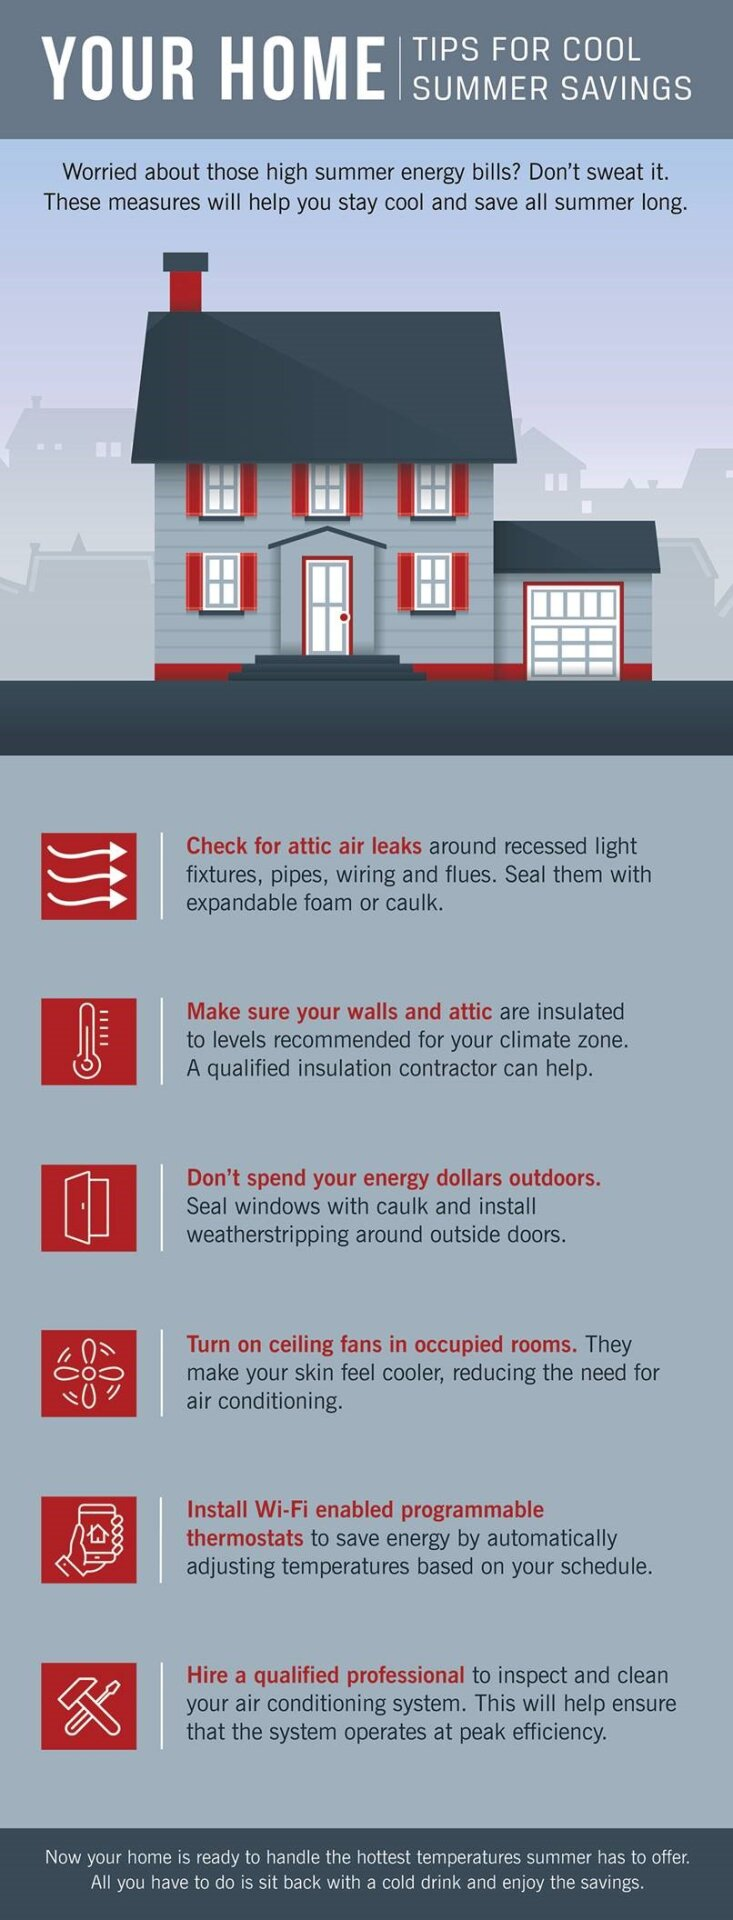 Tips for Saving on Energy Bills Infographic